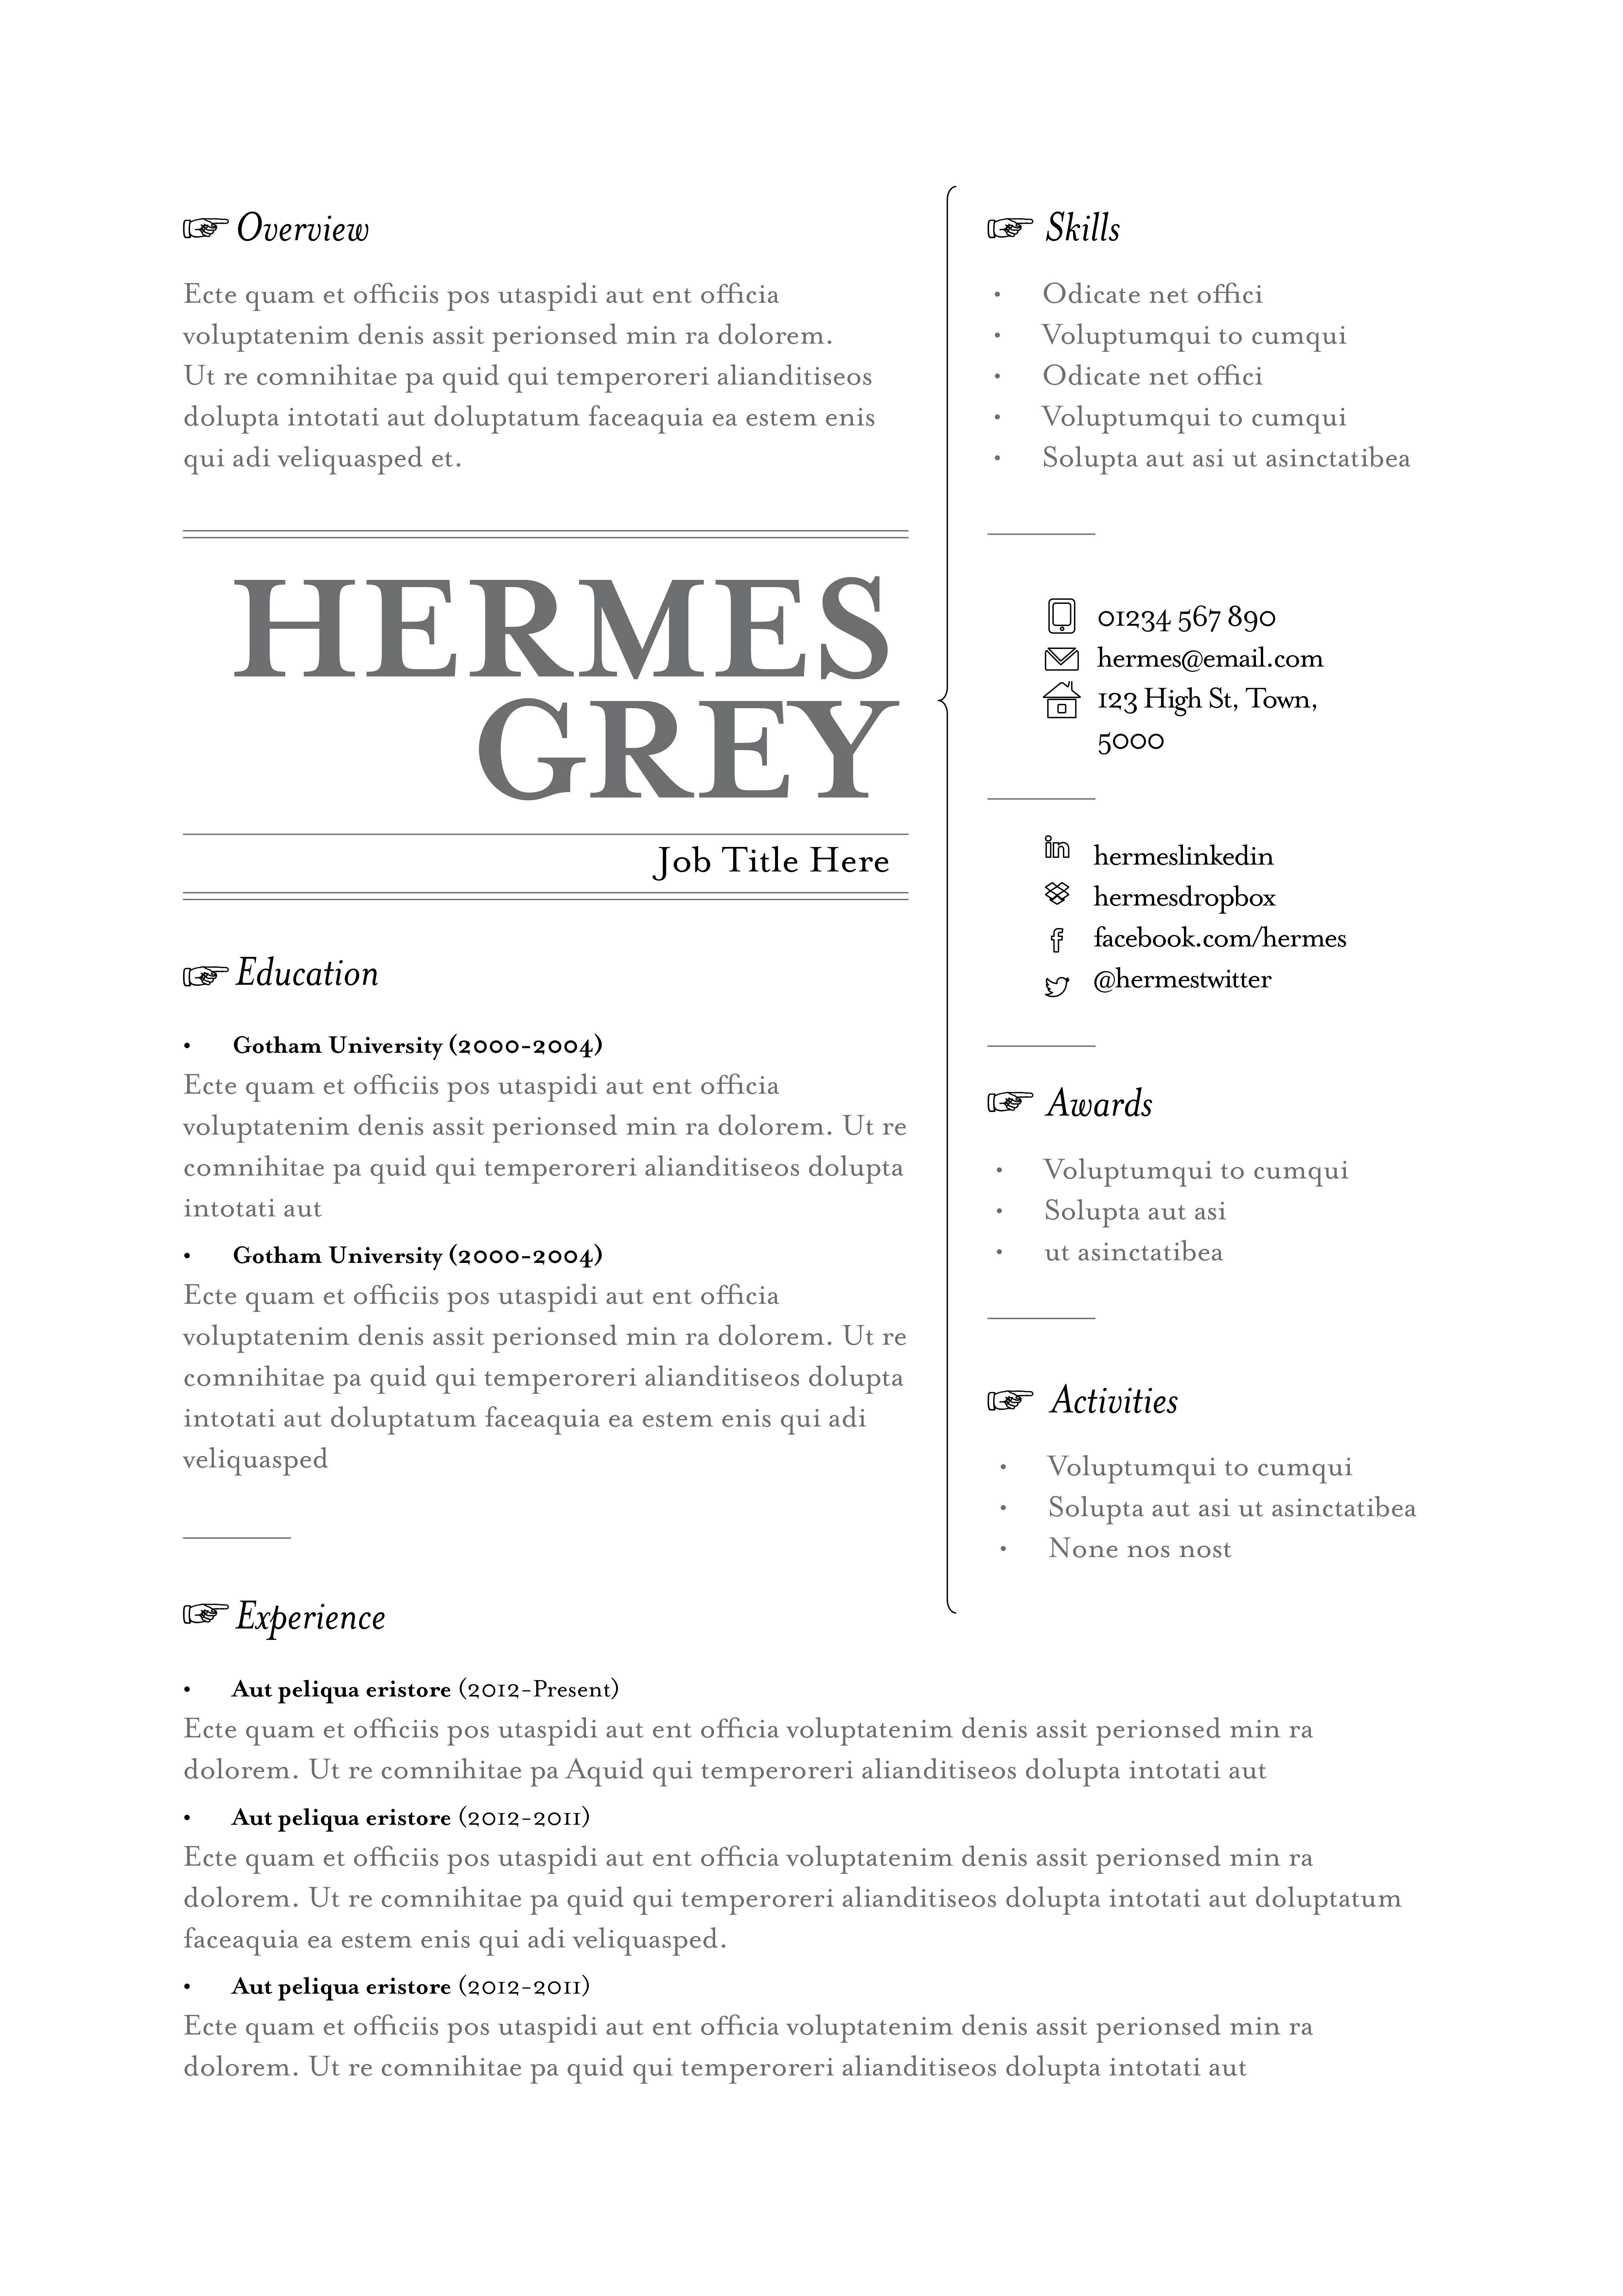 Functional Resume Template Australia